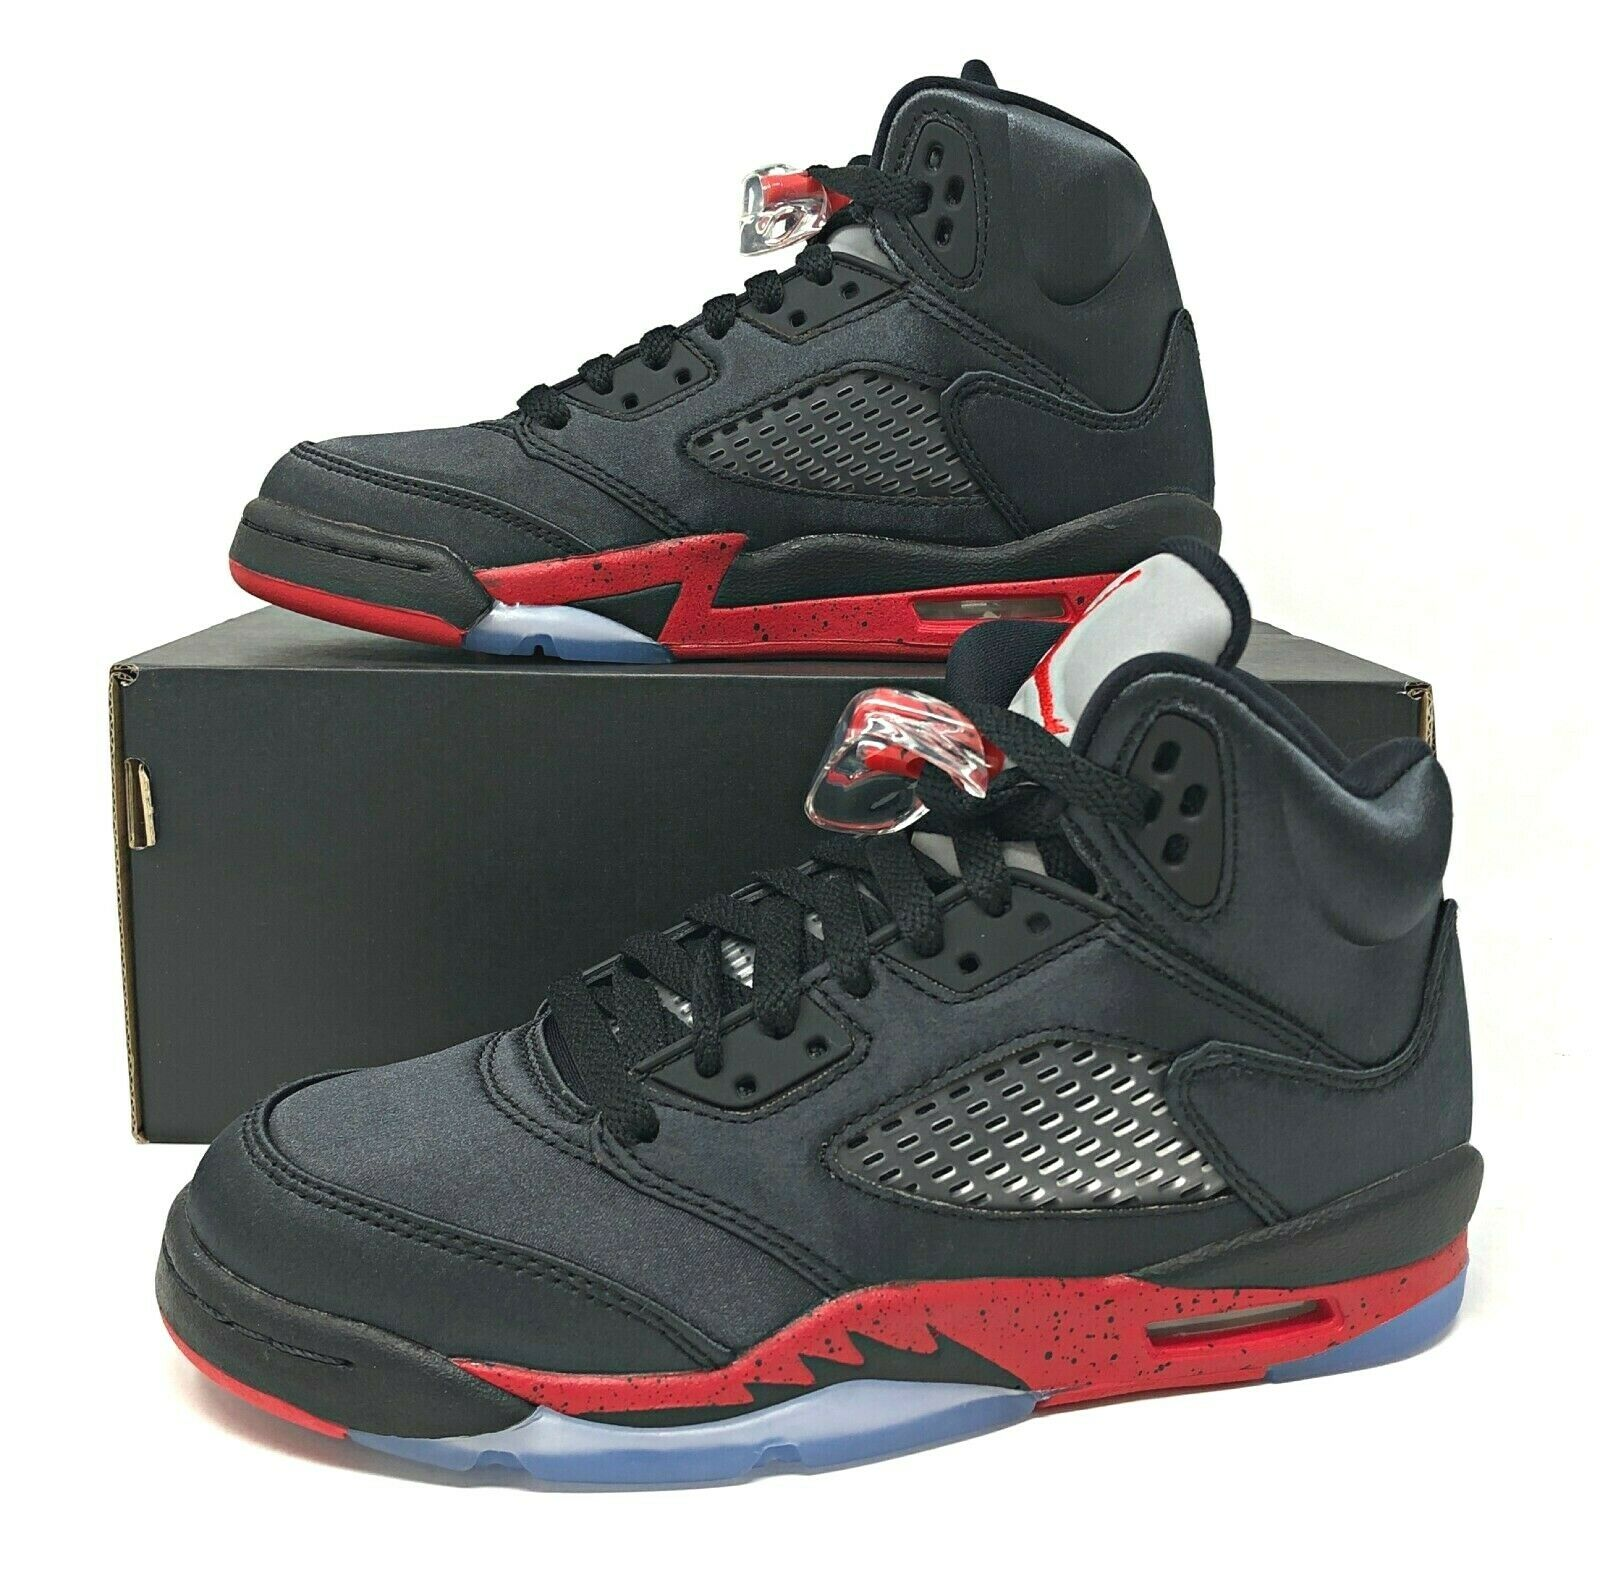 Air Jordan 5 Retro GS Satin Bred 2018 Black/red Kids Shoes Size 6y 440888 006